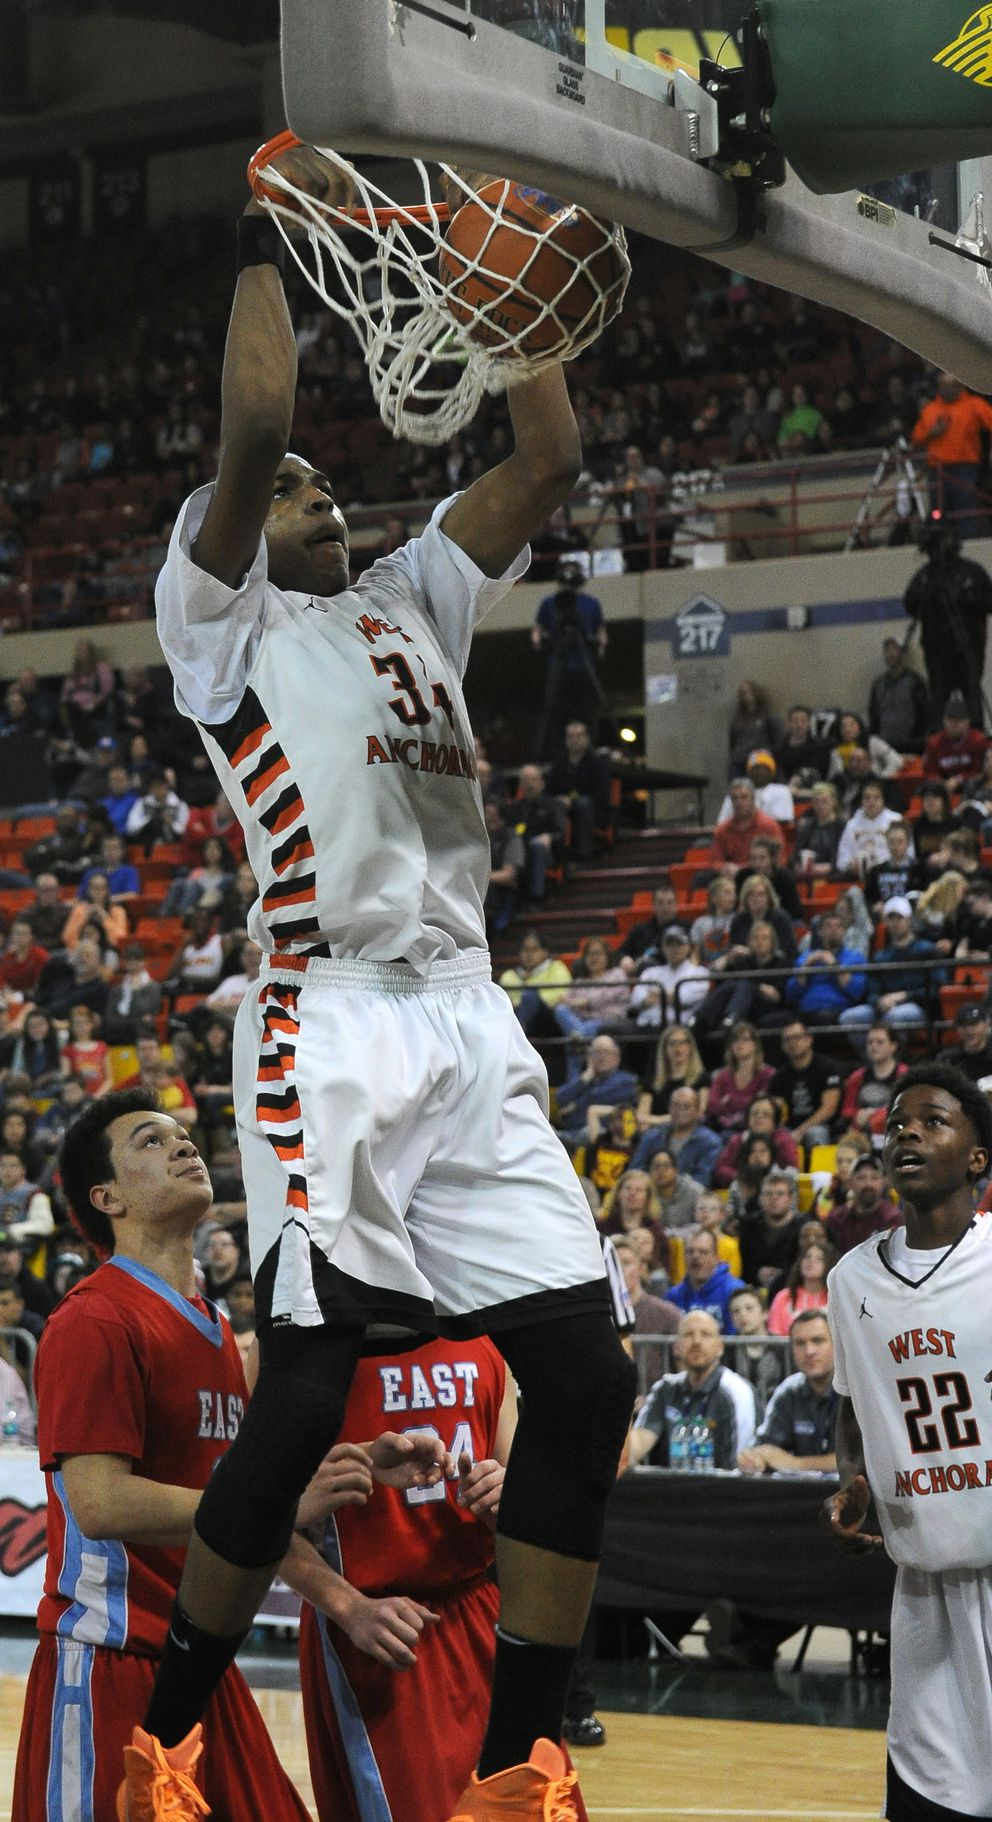 Brandon Huffman North Carolina Basketball Jersey - White